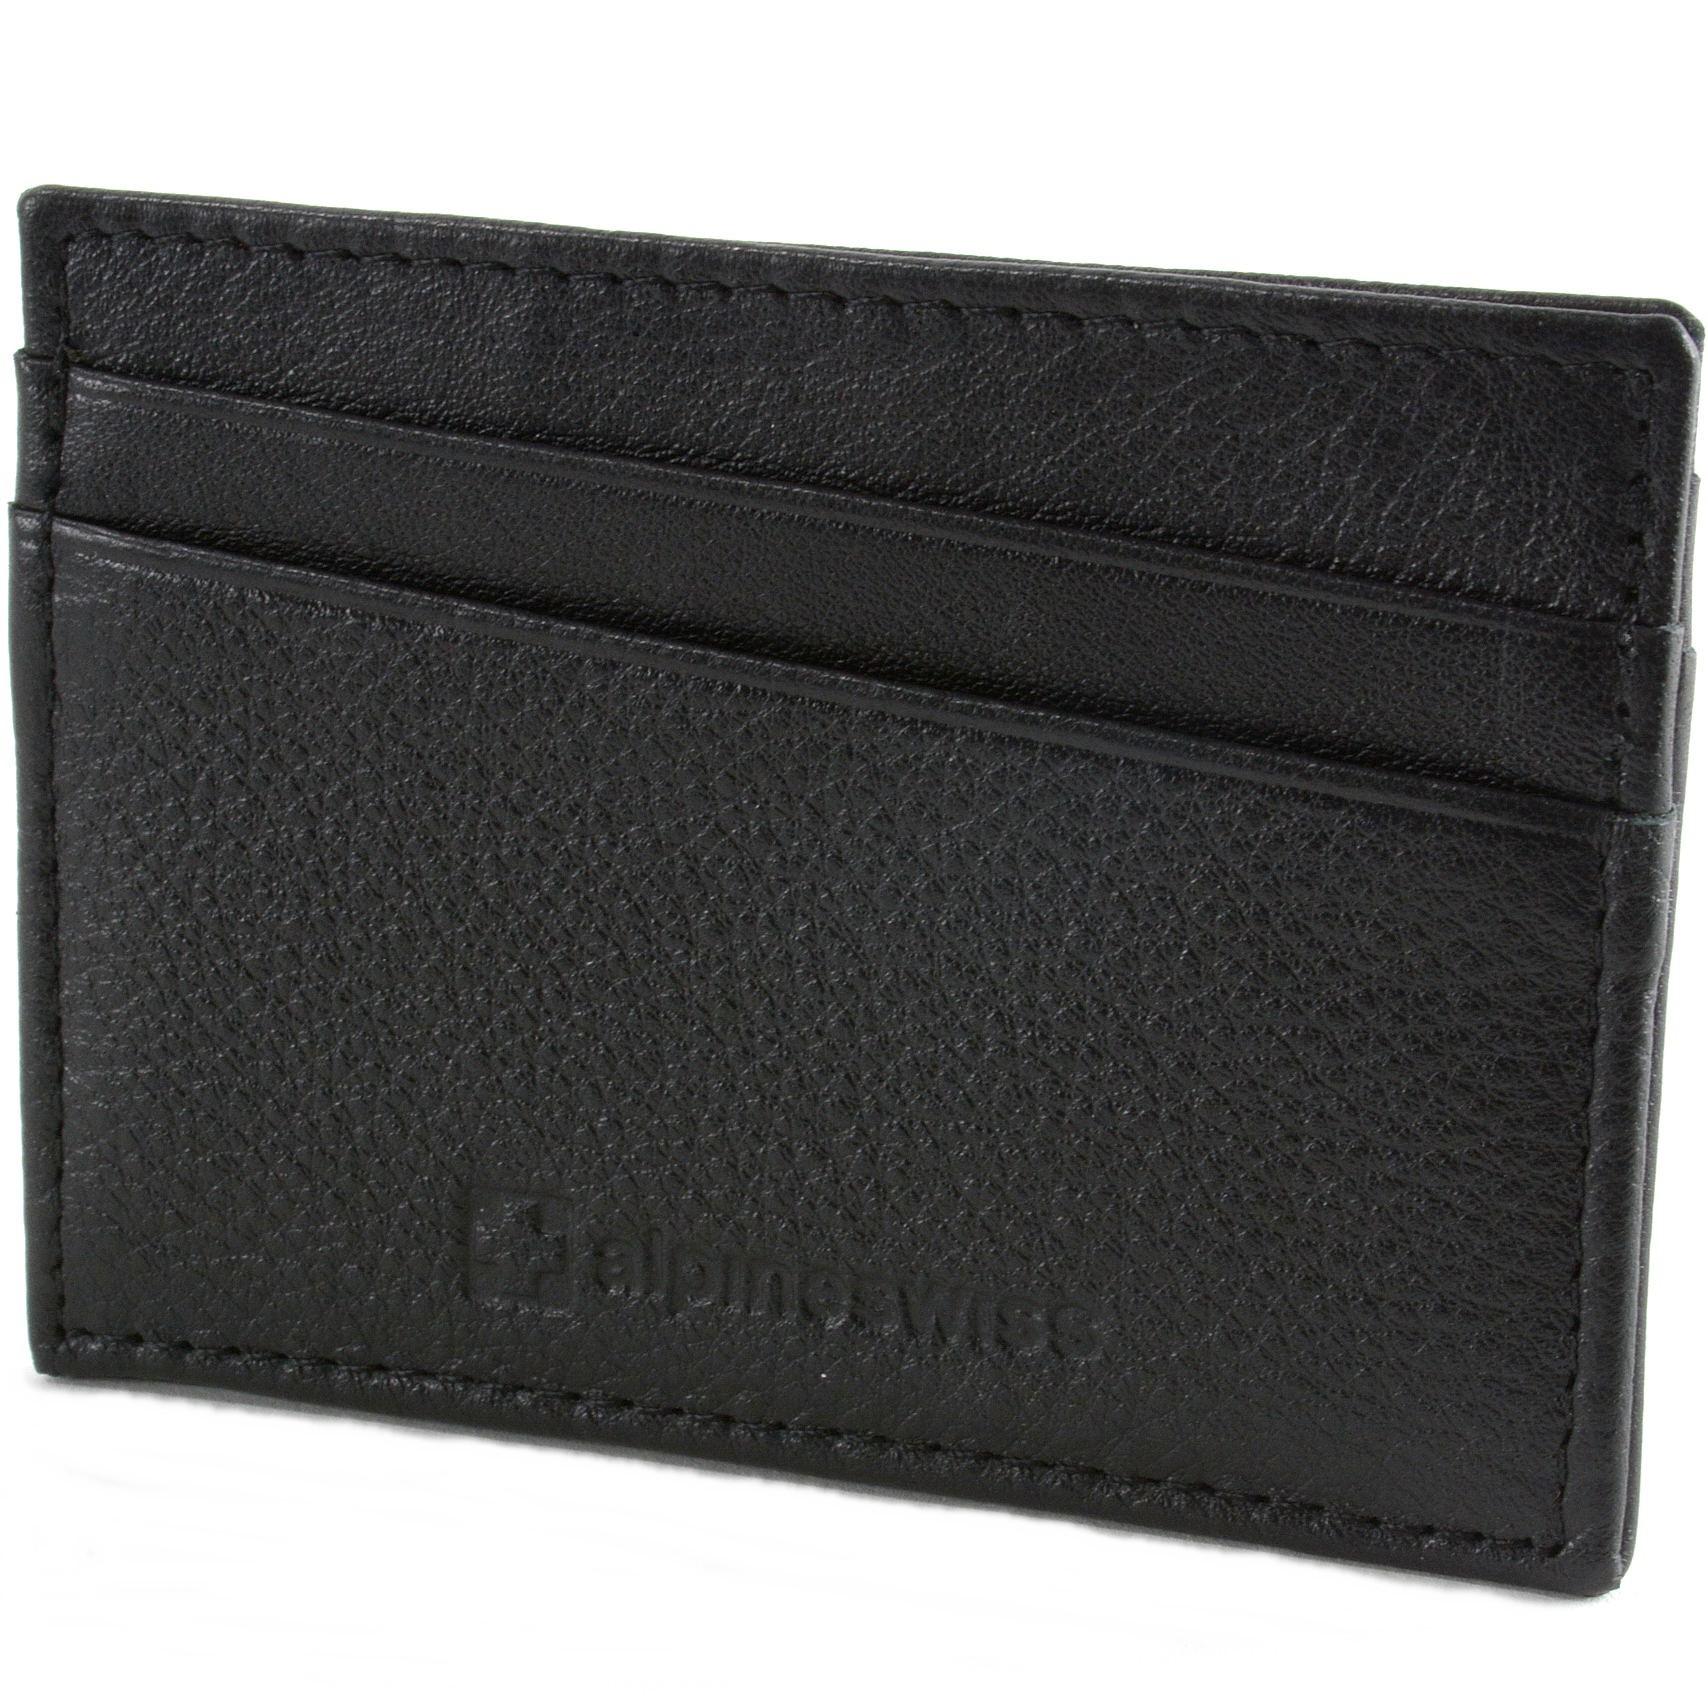 Alpine-Swiss-Minimalist-Leather-Front-Pocket-Wallet-5-Card-Slots-Slim-Thin-Case thumbnail 22